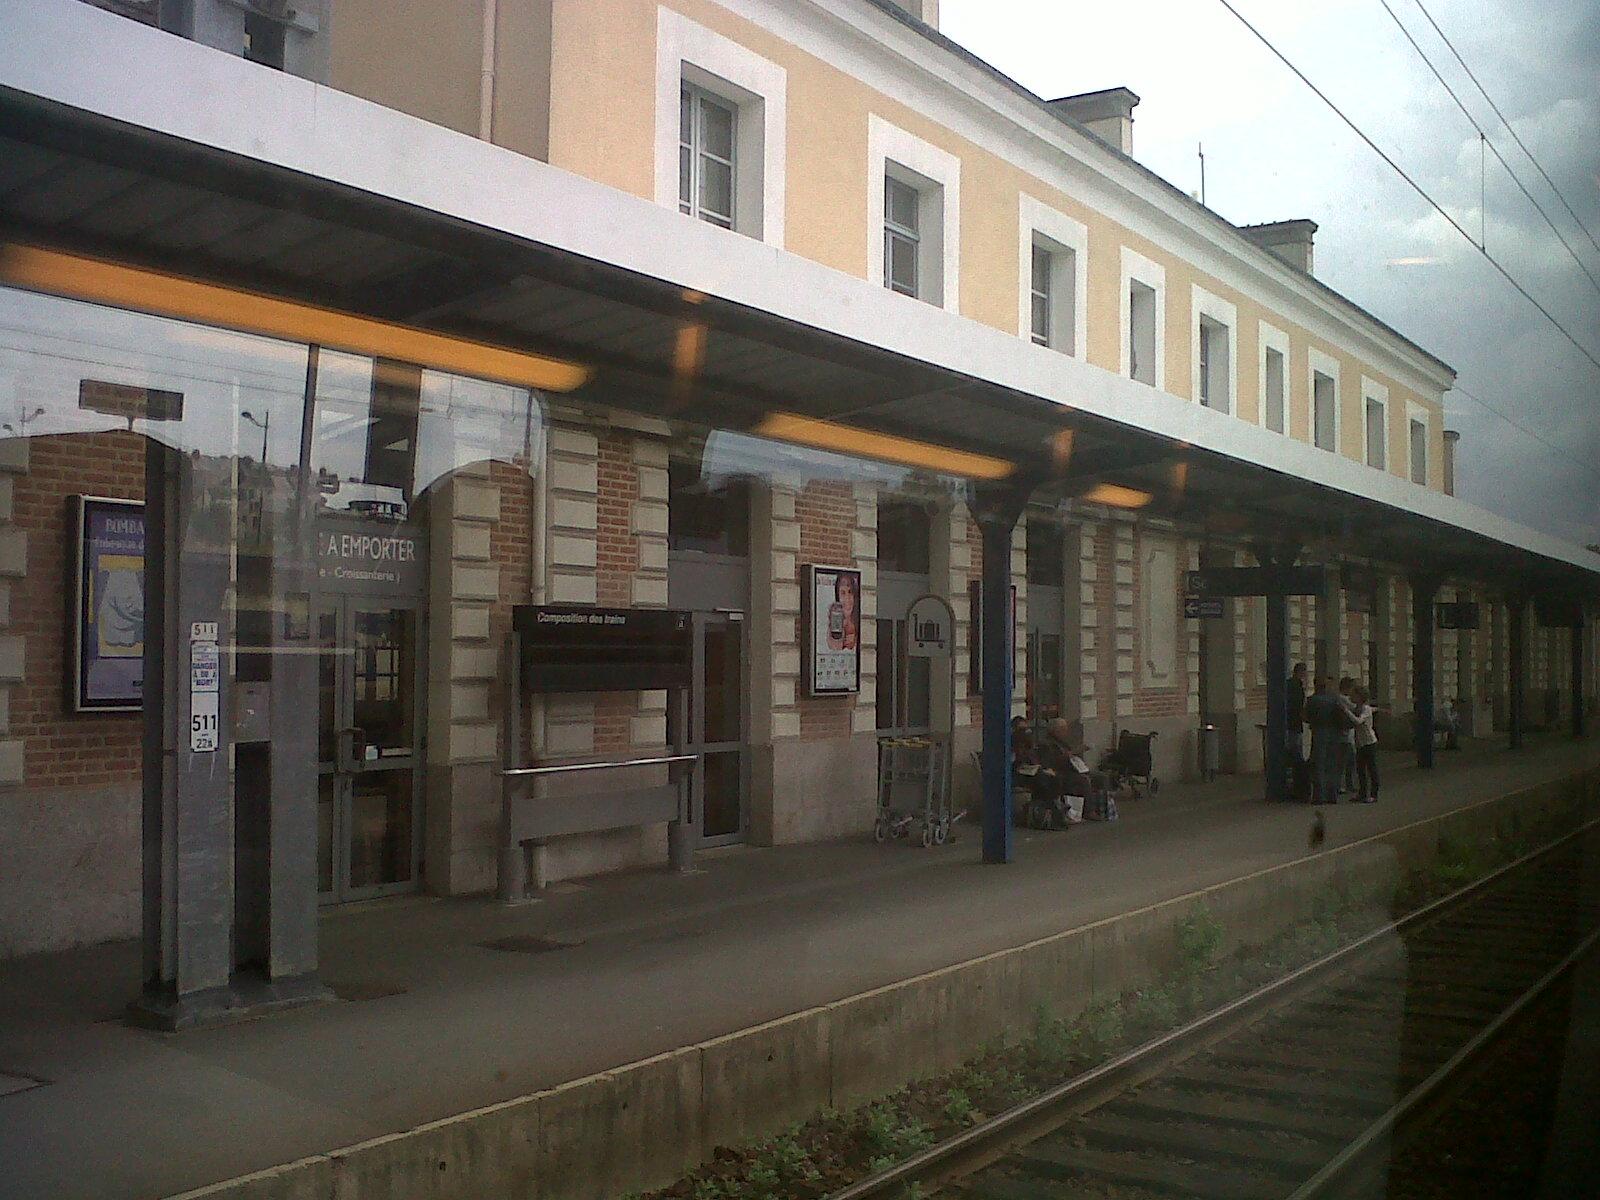 redon gare train station arriv jun12